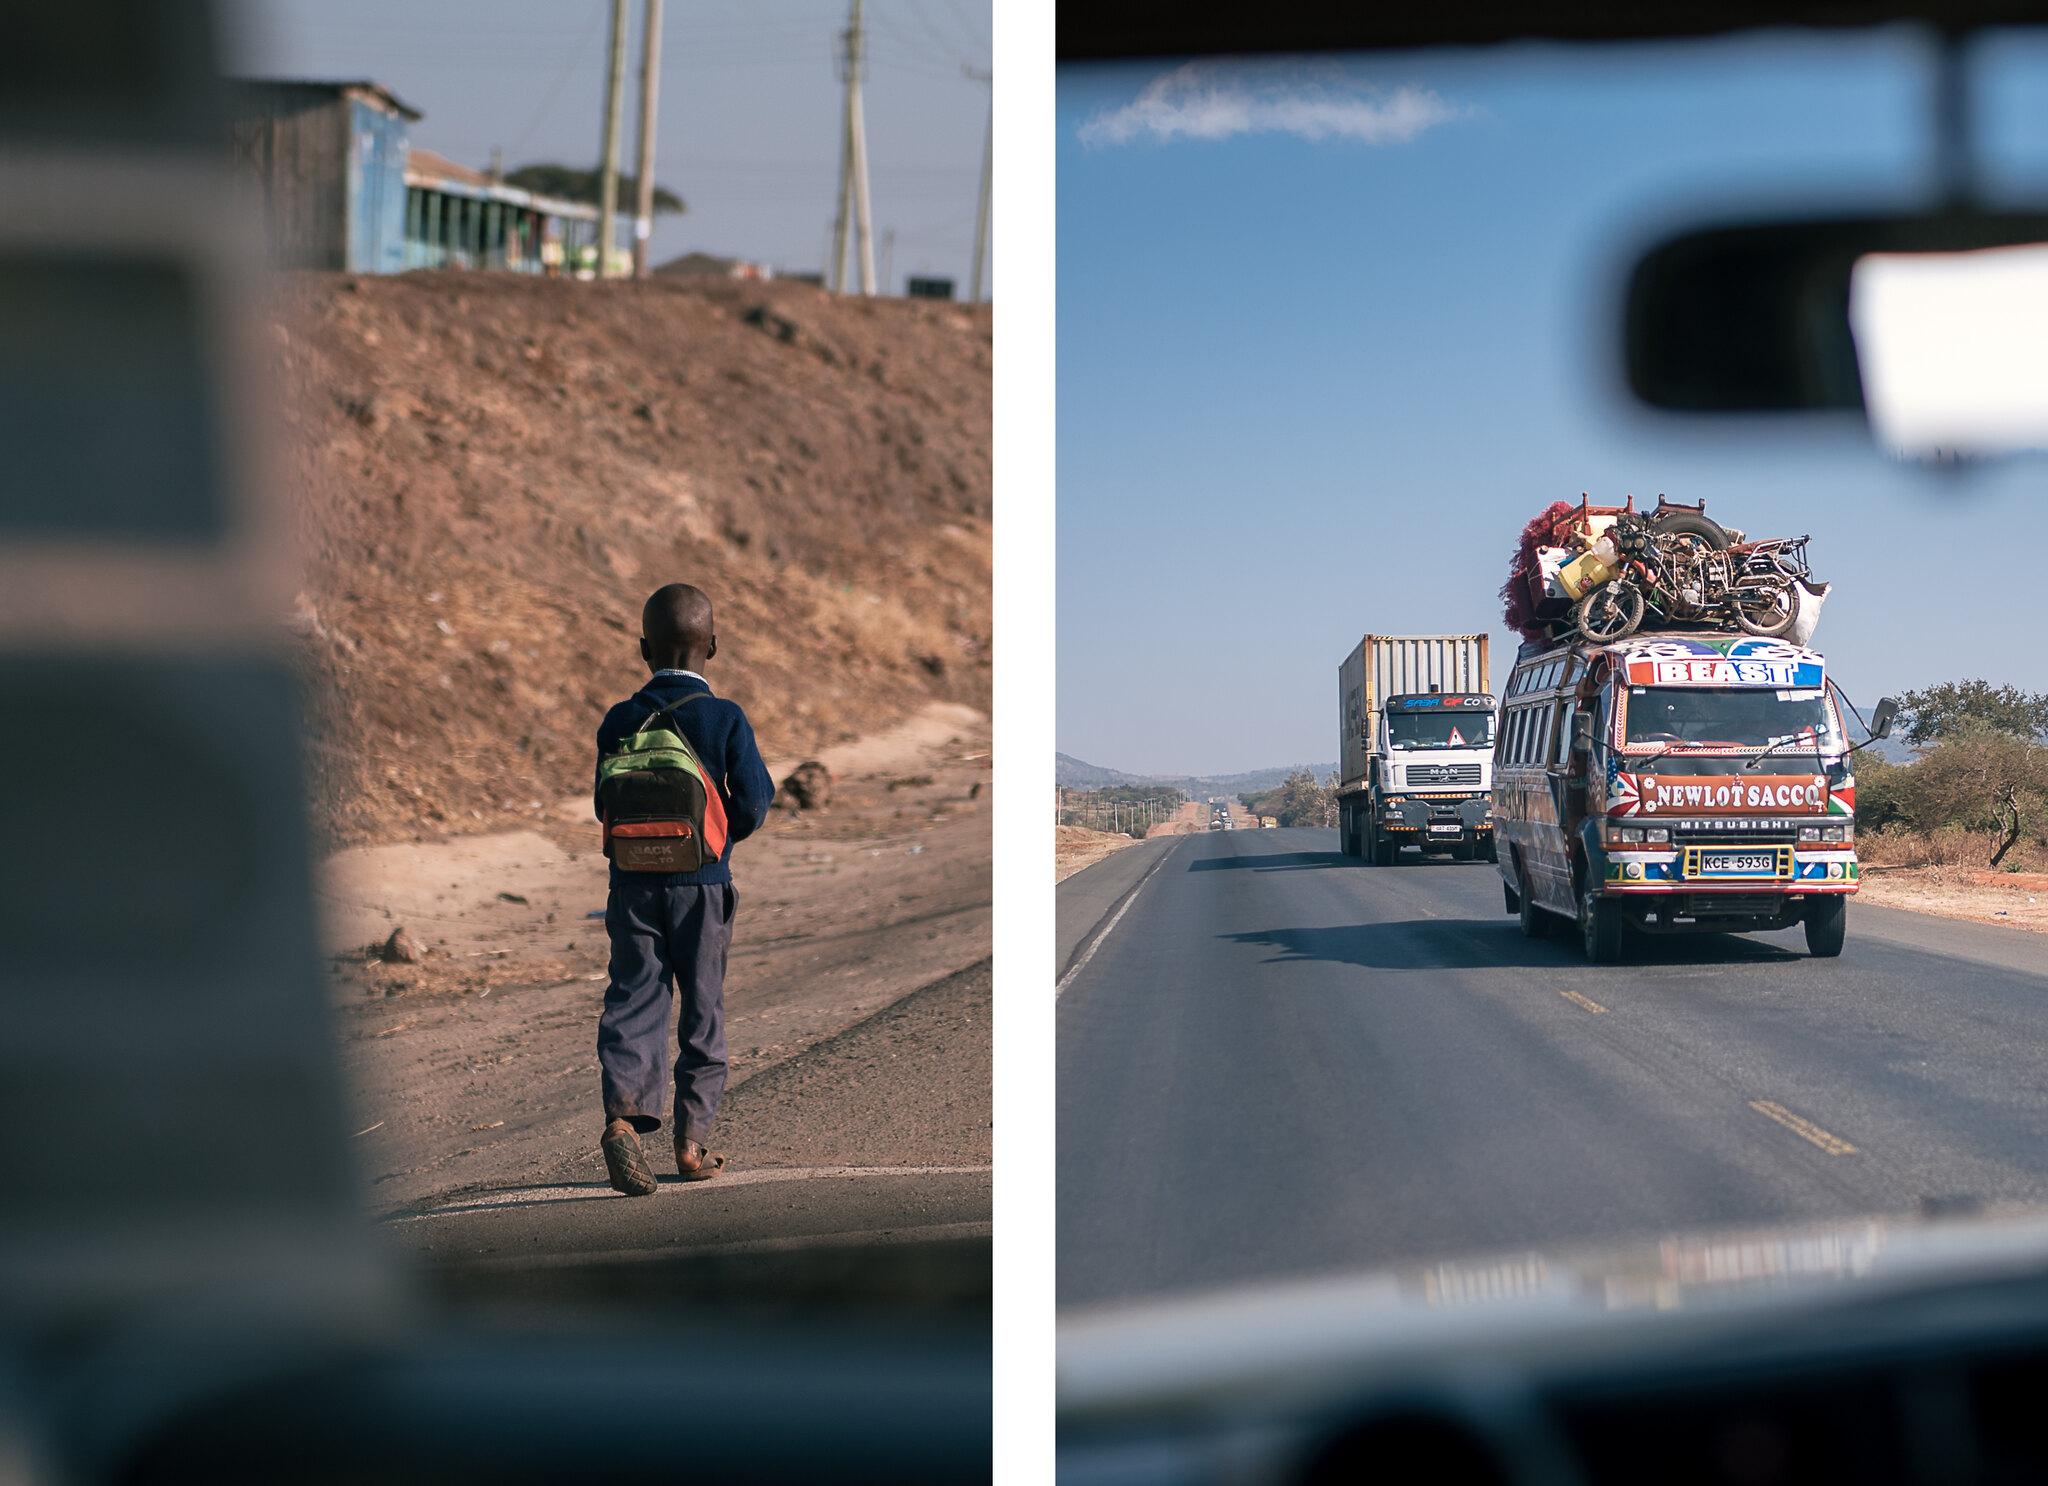 Kenya street impressions